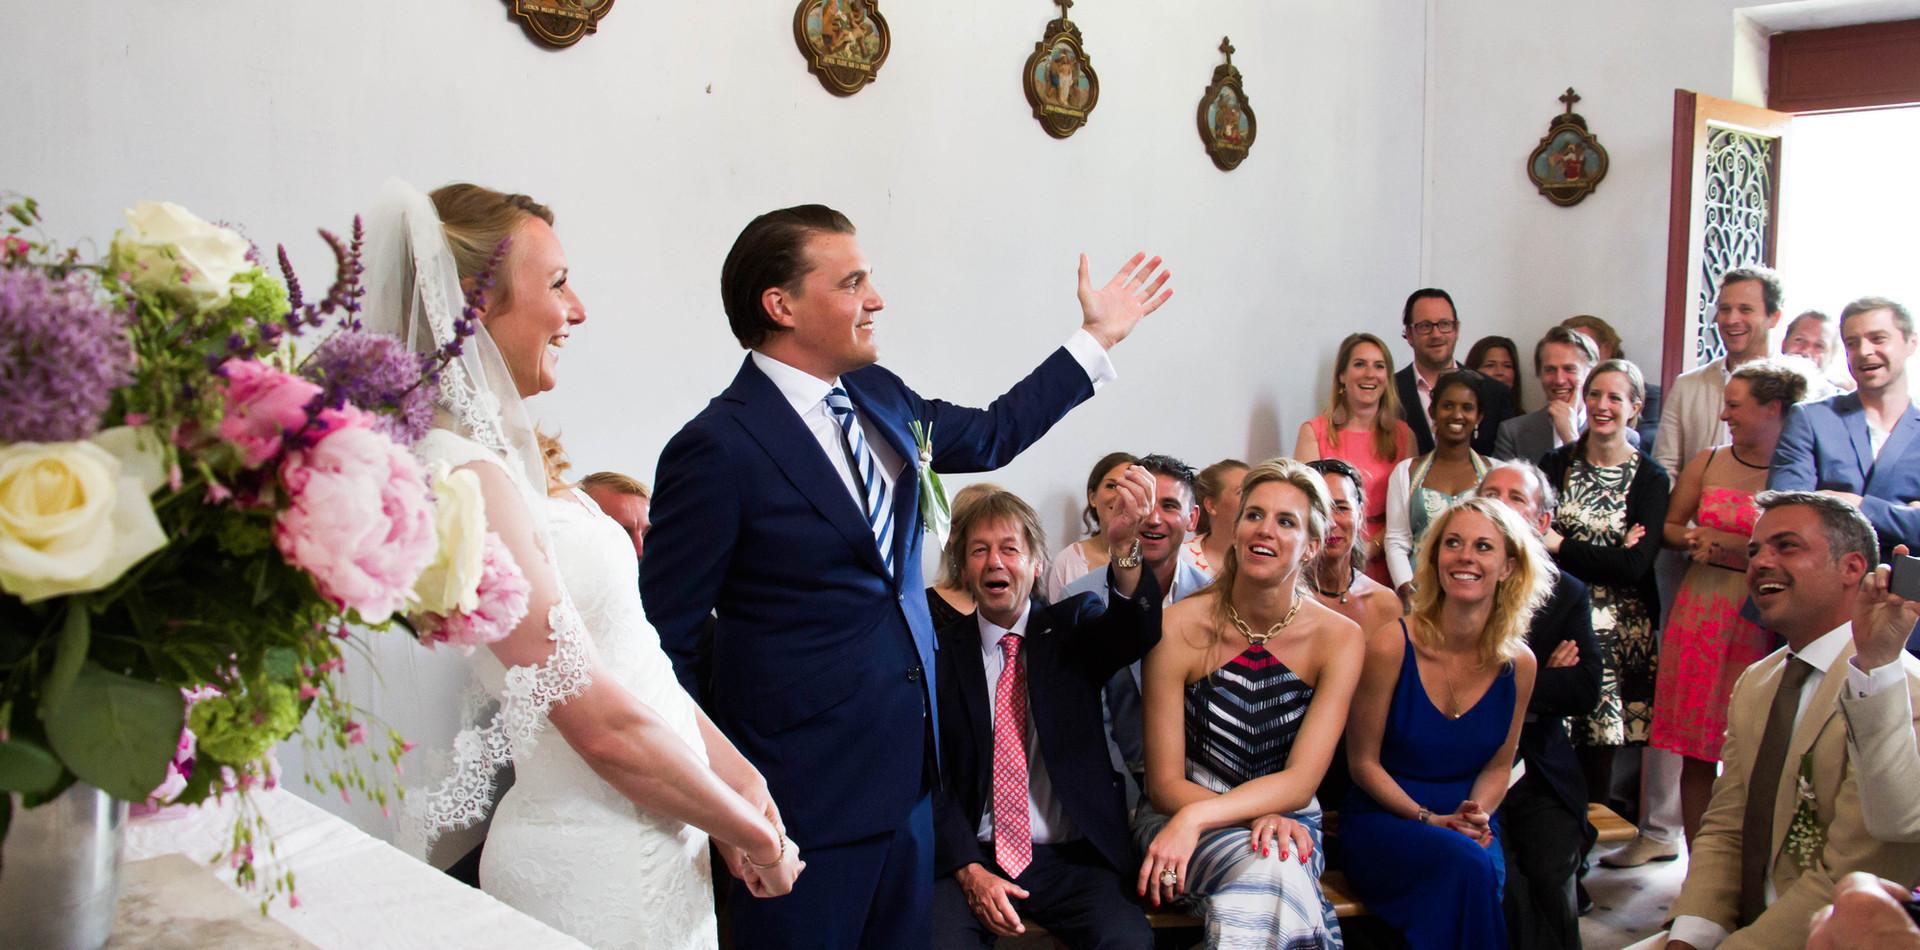 18th CENTURY WEDDING CHAPEL